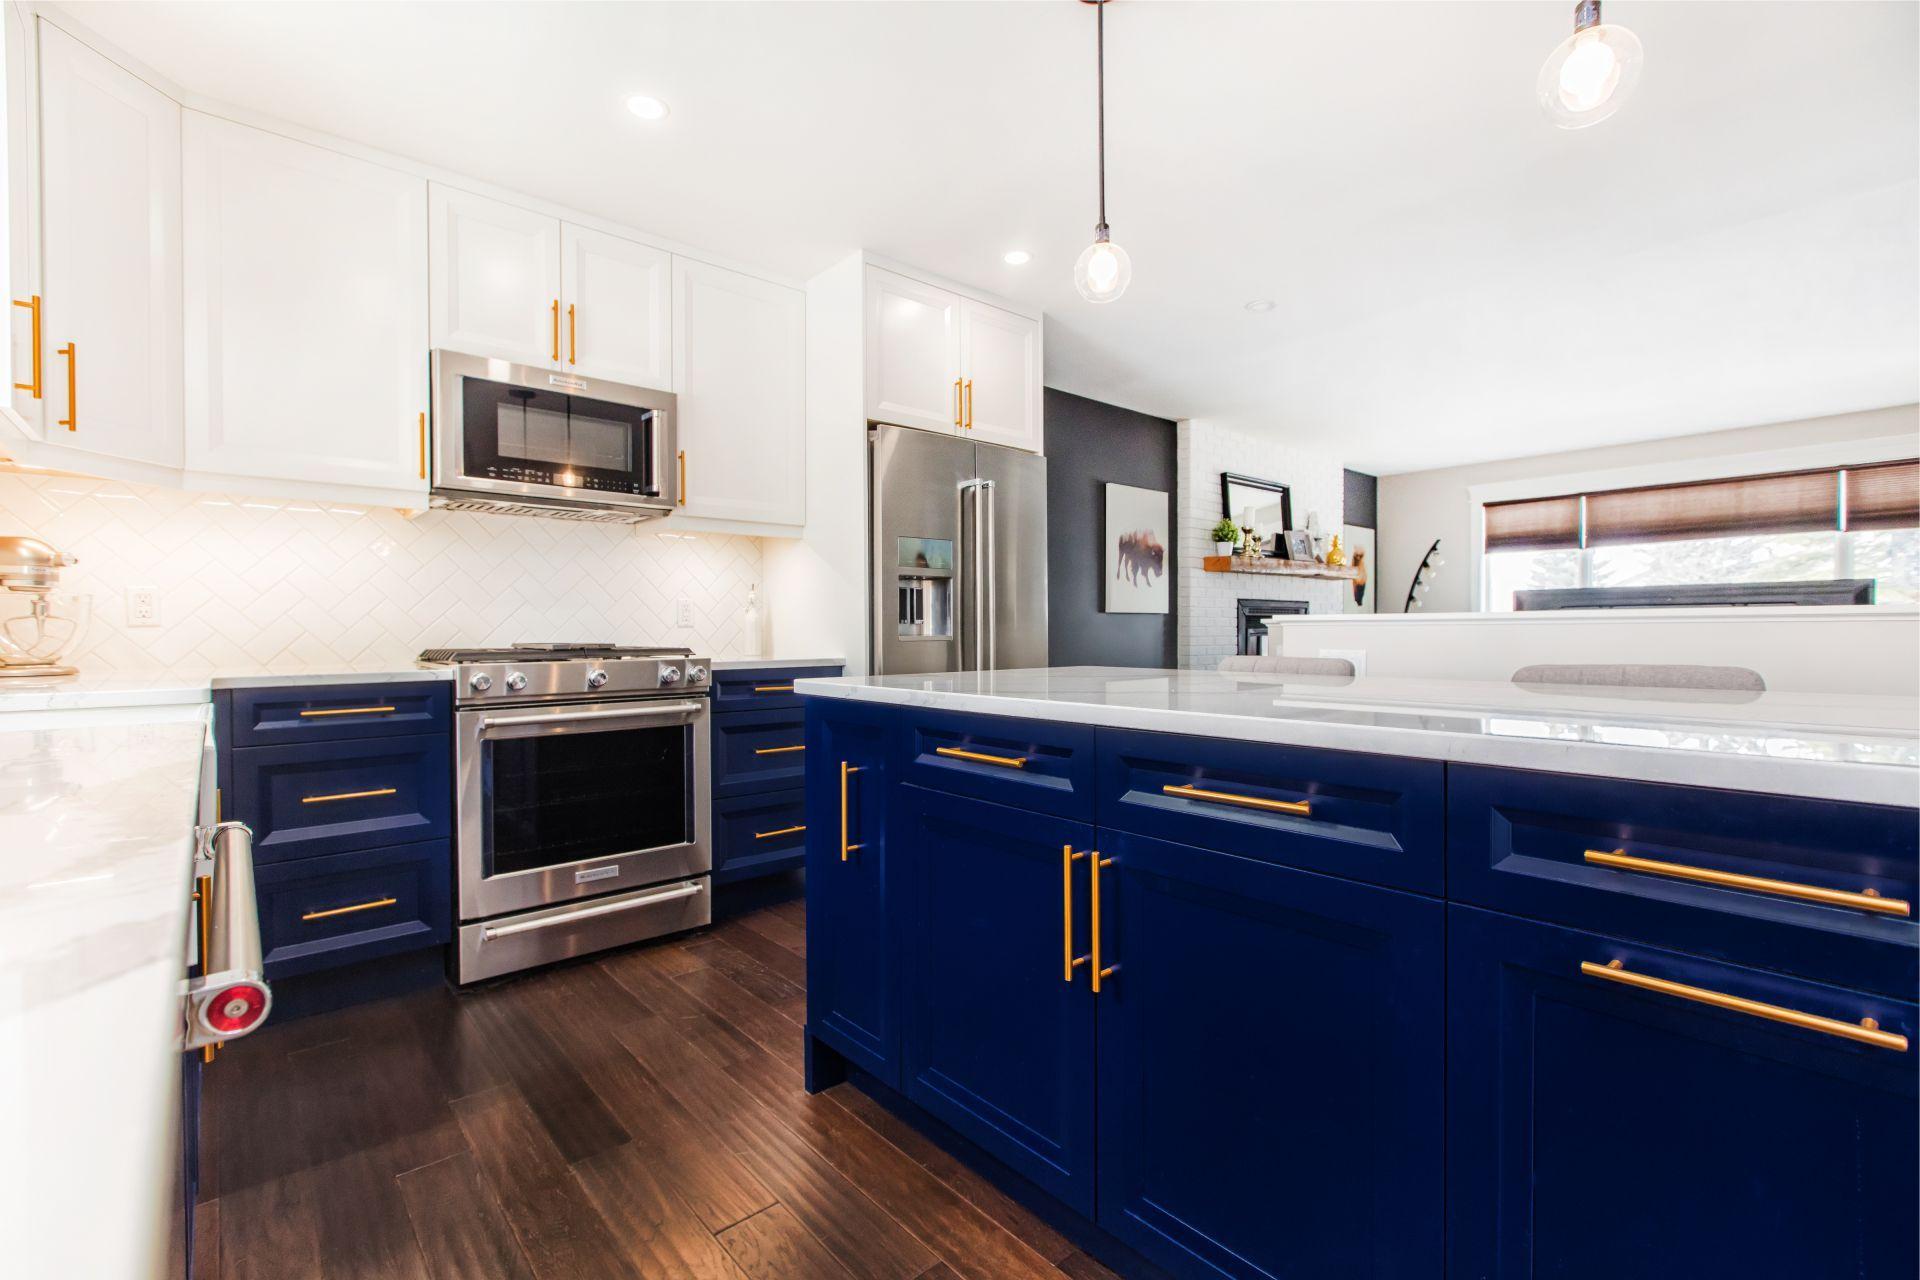 Custom Kitchen Cabinets Edmonton Ab West Wolf Design In 2021 Kitchen Cabinets Blue Kitchen Cabinets Custom Kitchen Cabinets